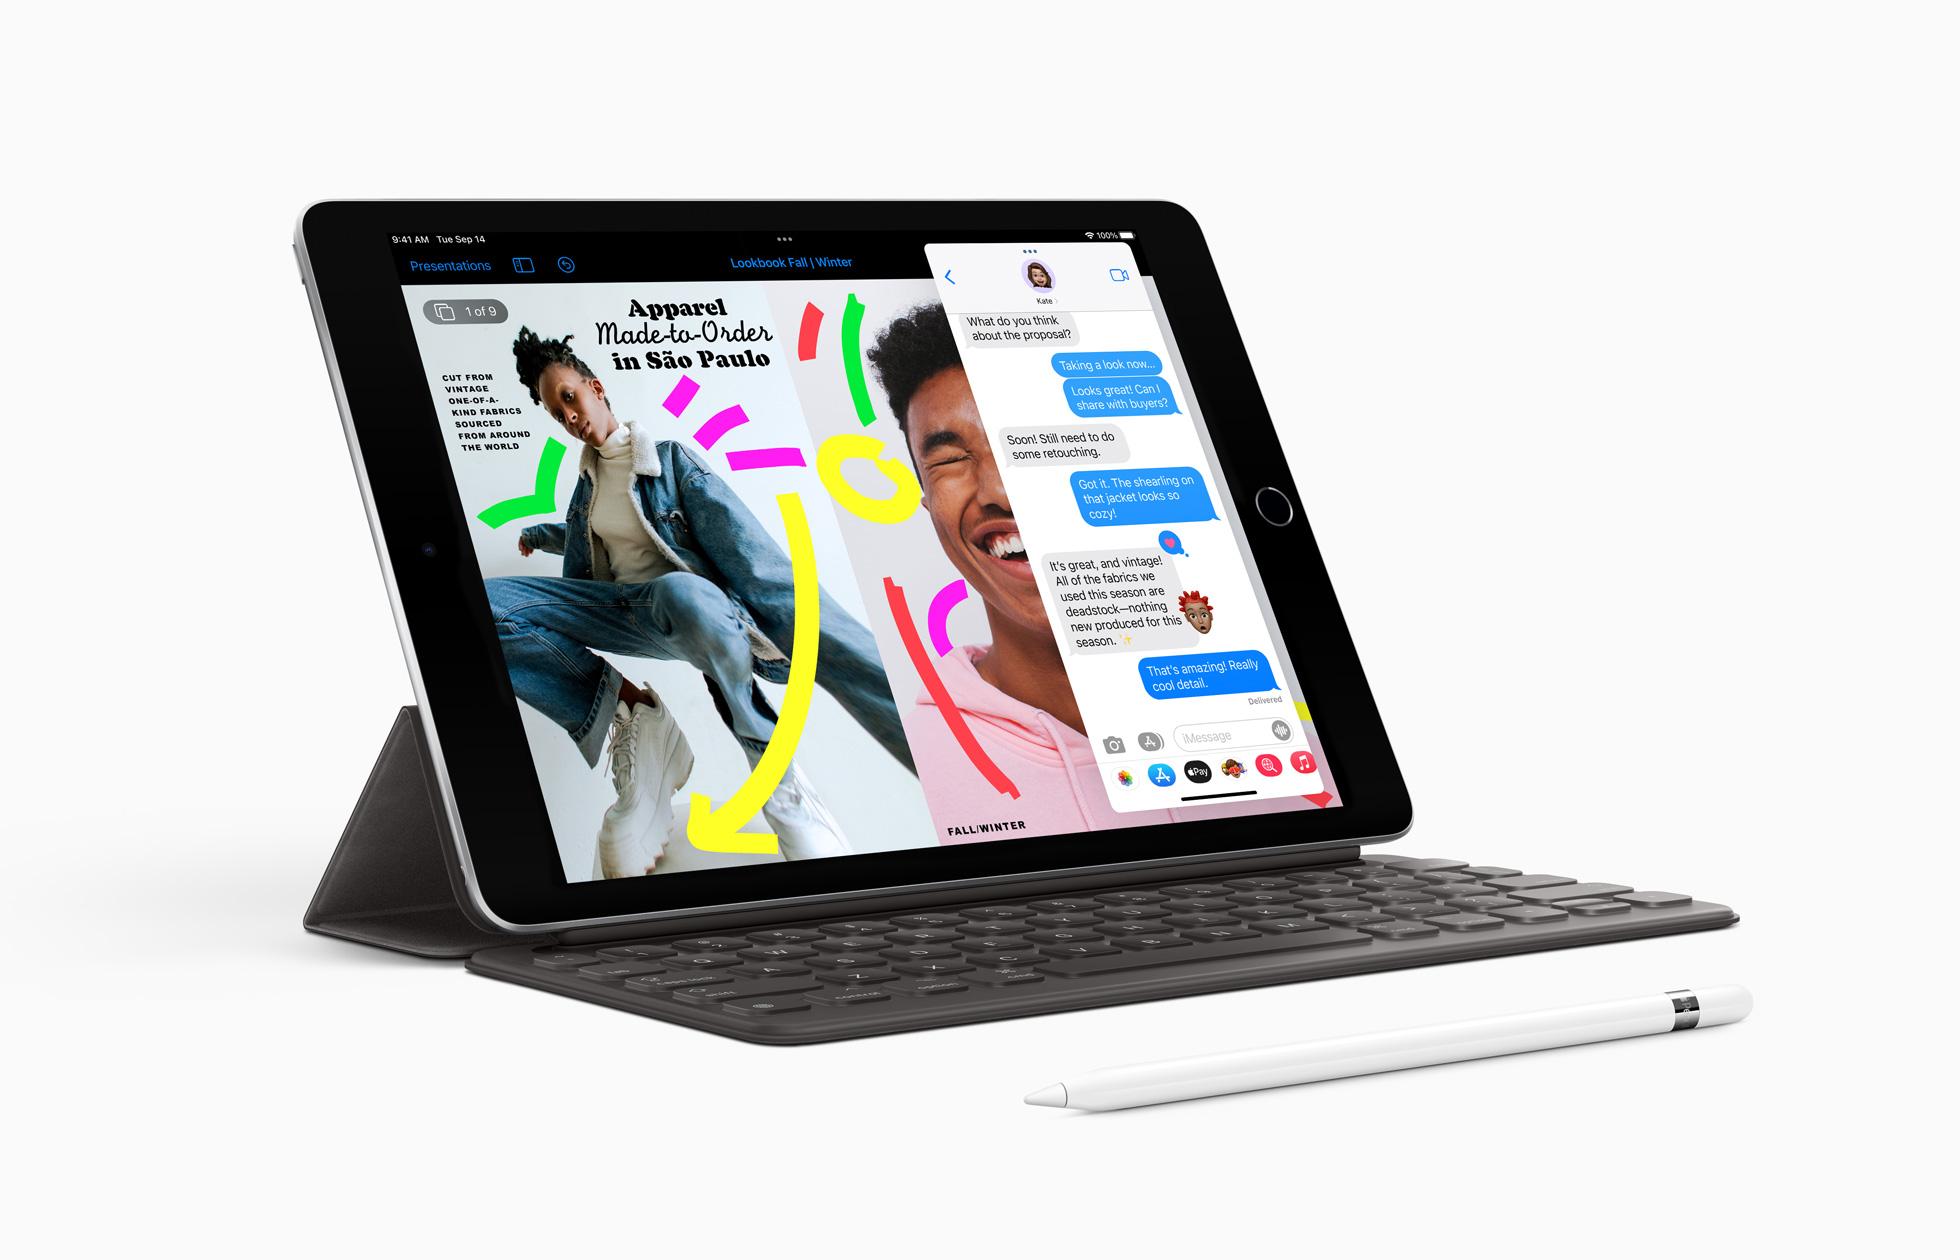 How to pre-order the 'new' iPad and iPad mini